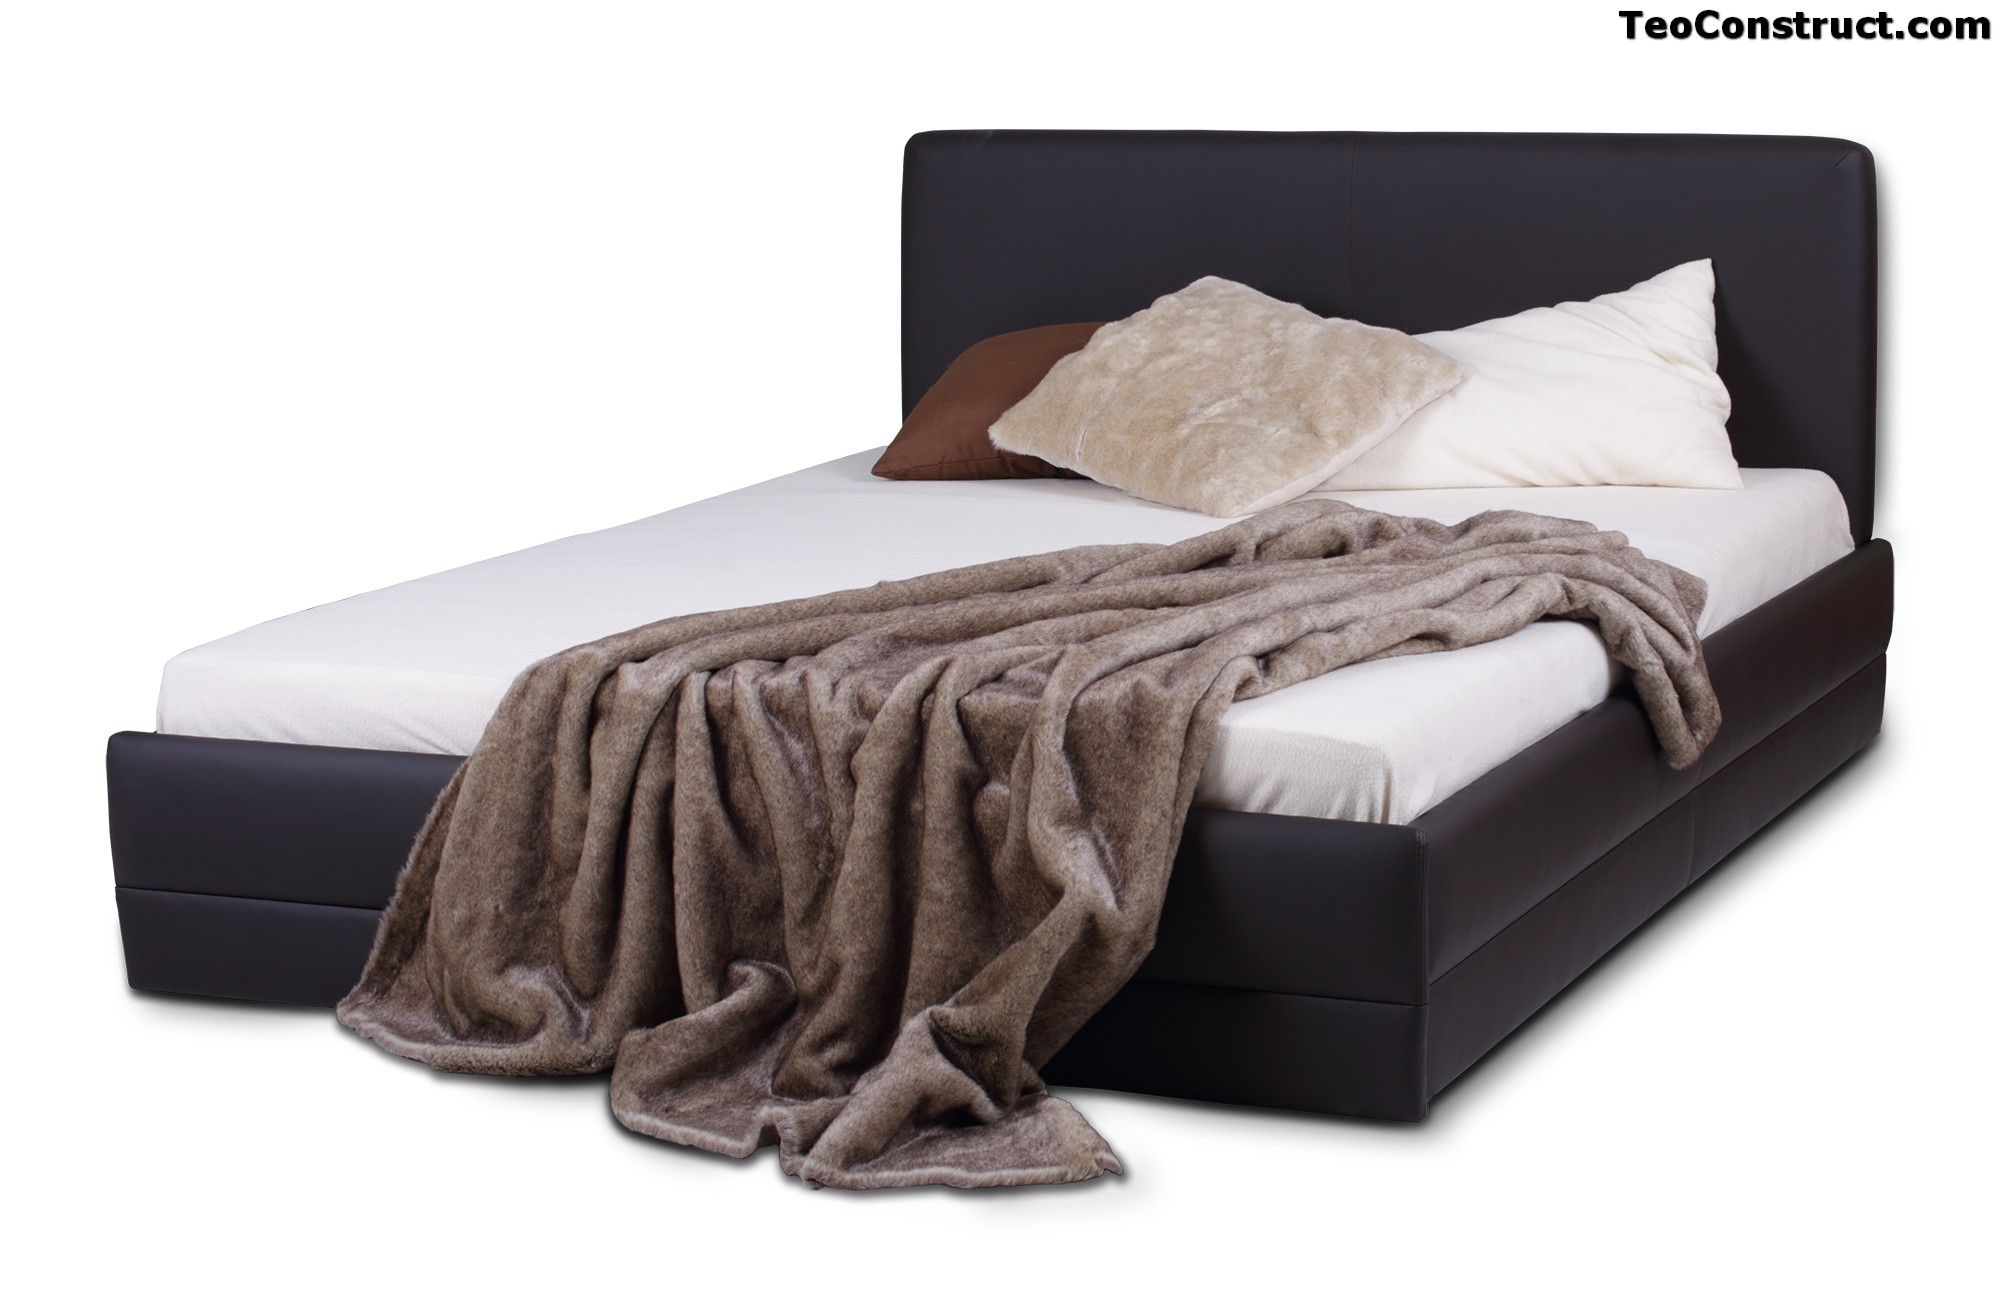 Seturi de dormitoare ieftine Toledo01